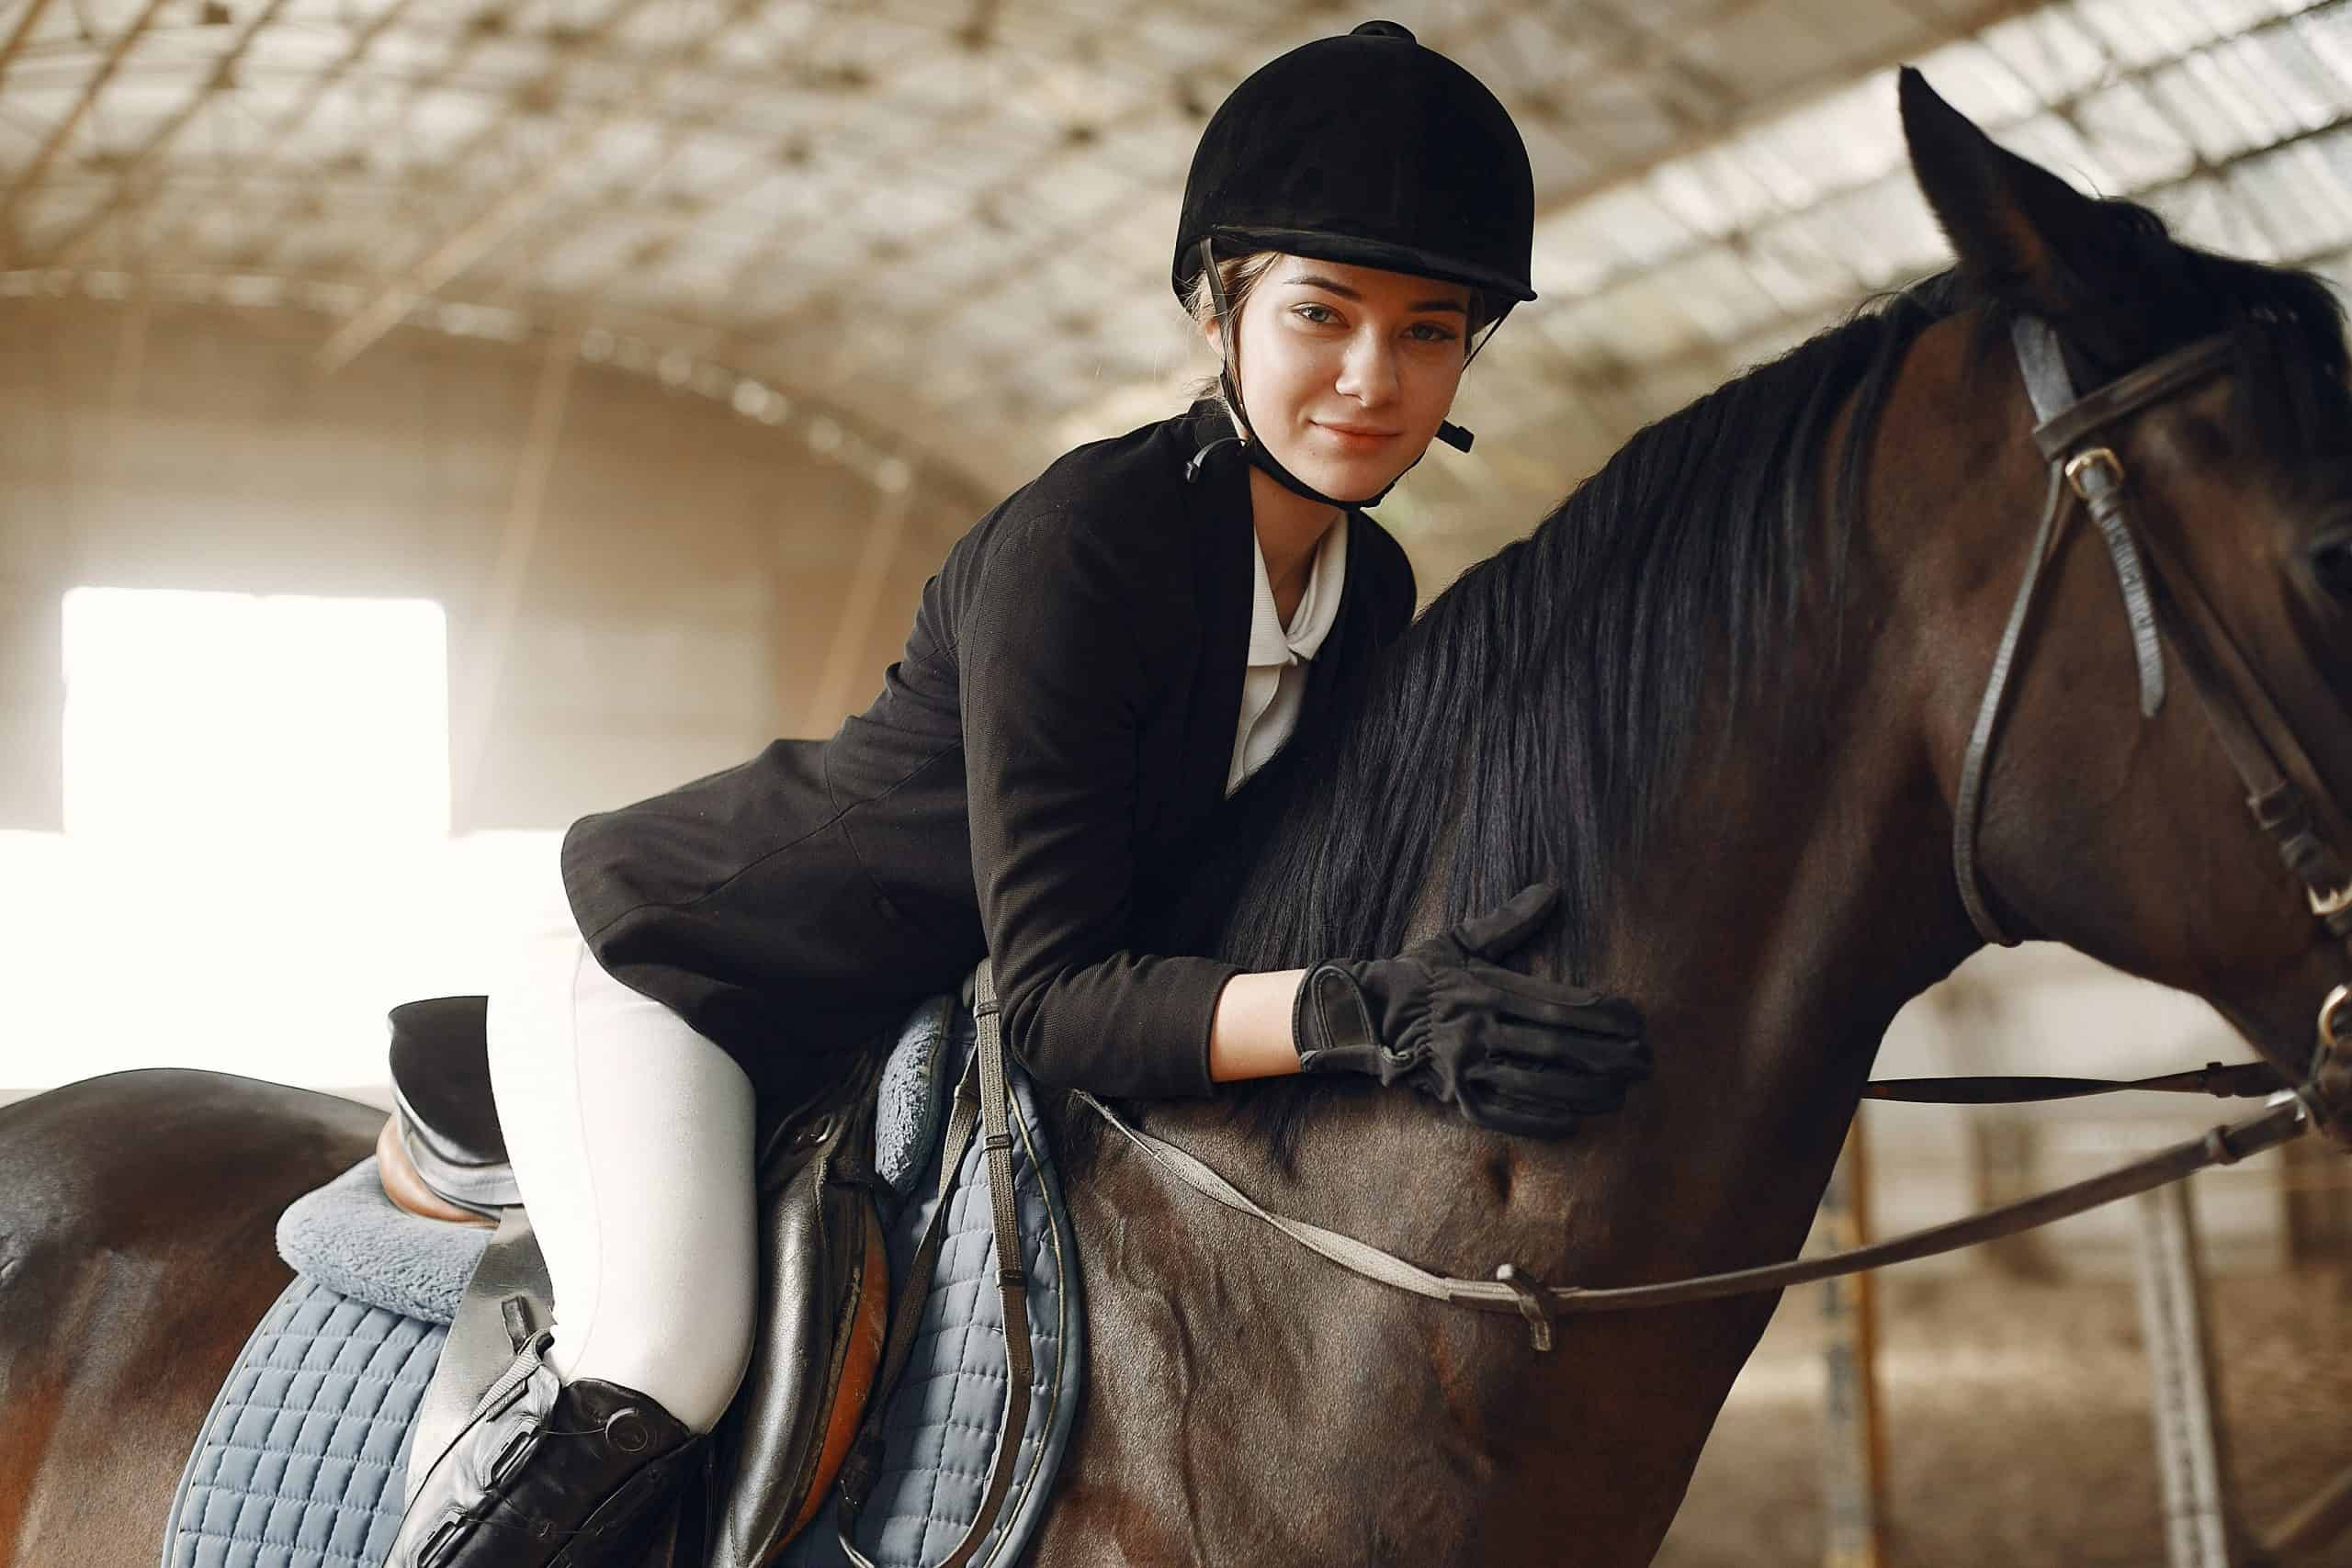 Woman on a horseback. Rider in a black uniform